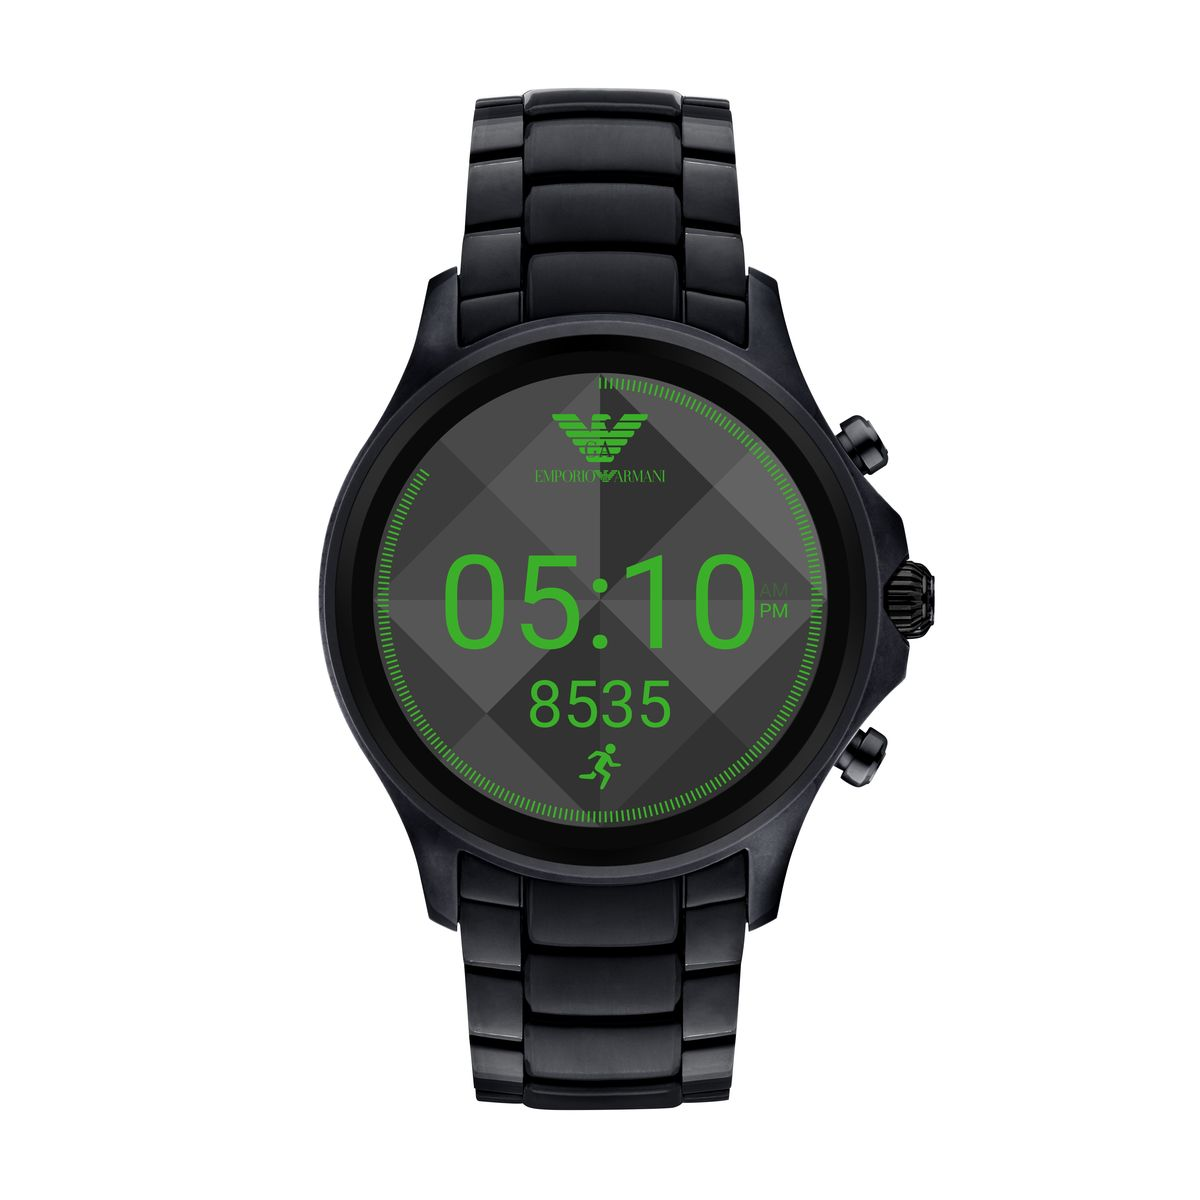 Grayson e Sofia, i nuovi smartwatch di Michael Kors